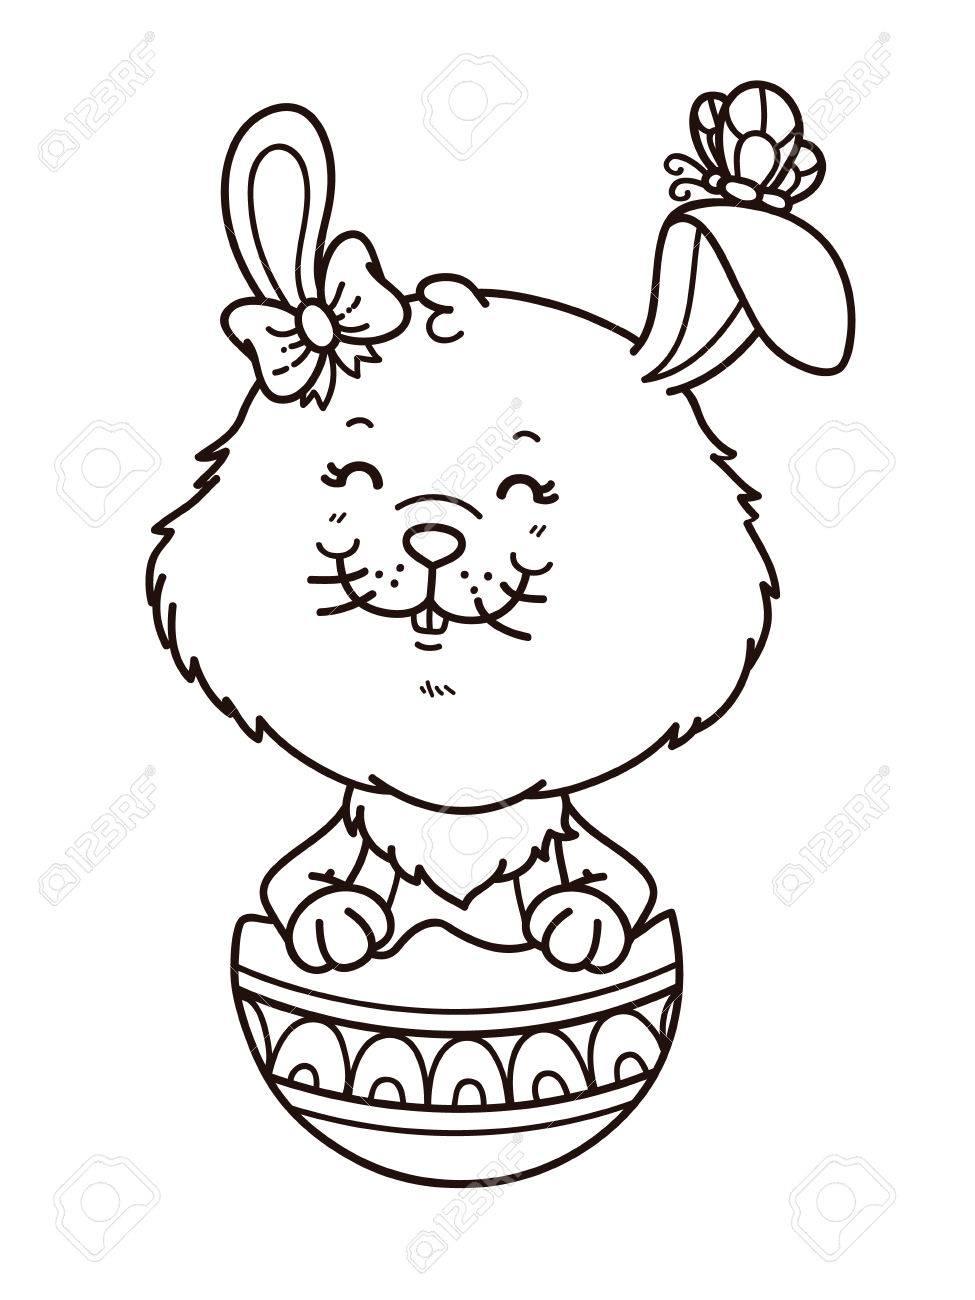 Feliz Conejito Chica Pascua. Vector Sello Digital Del Conejo De ...